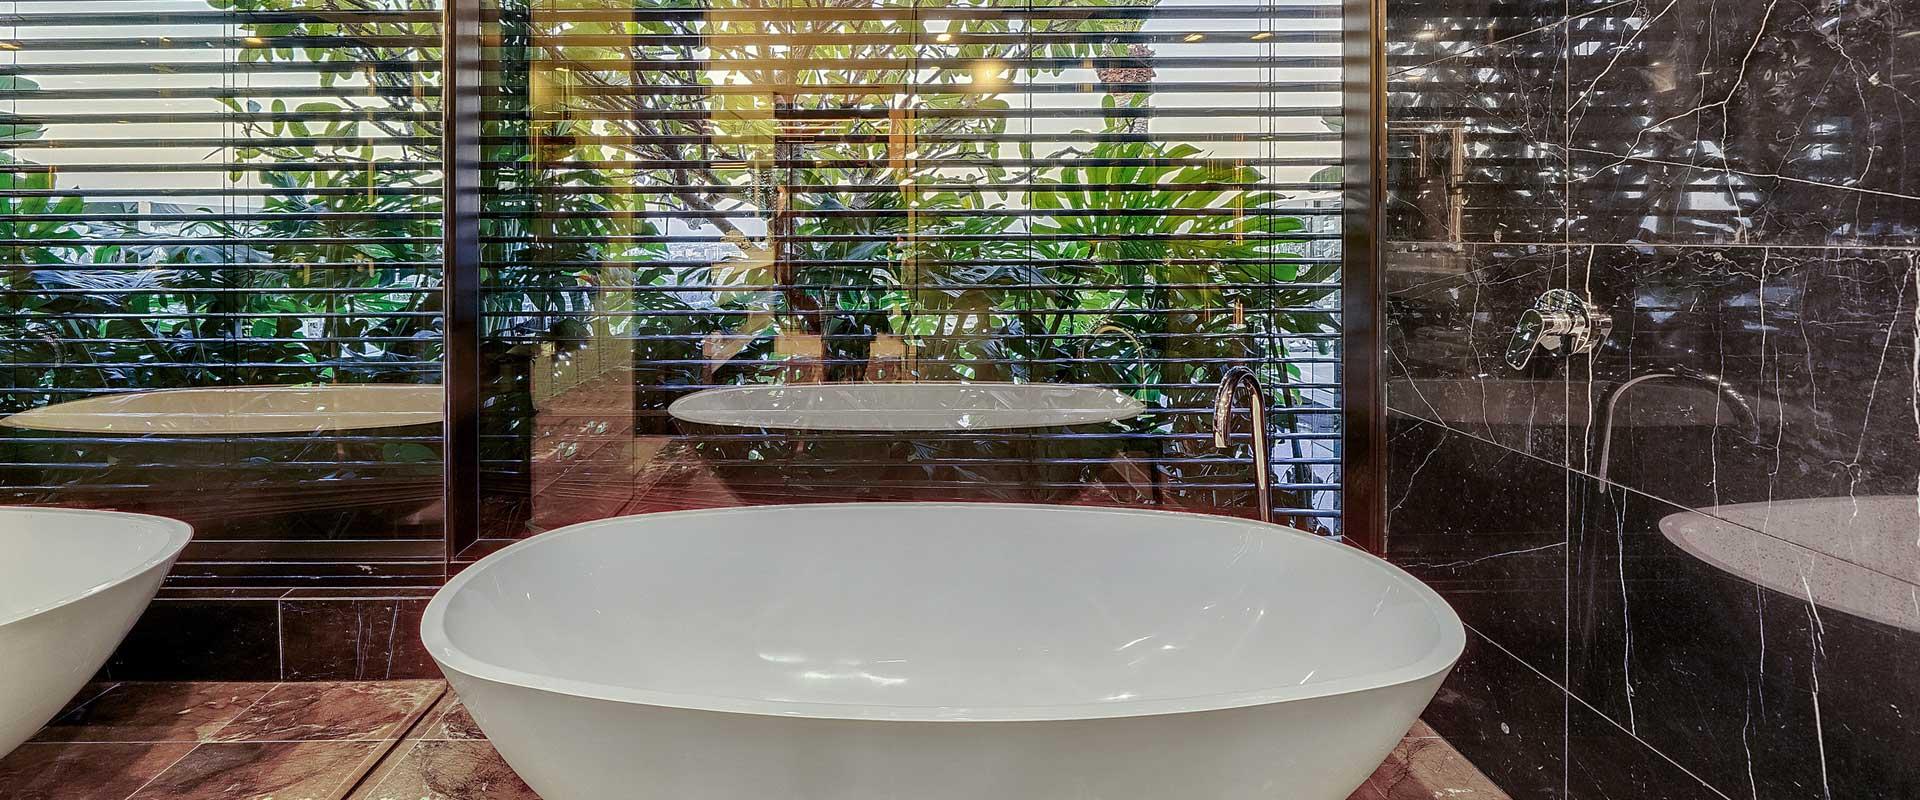 Vental Brisbane - Emporium external blinds by Dove Industry